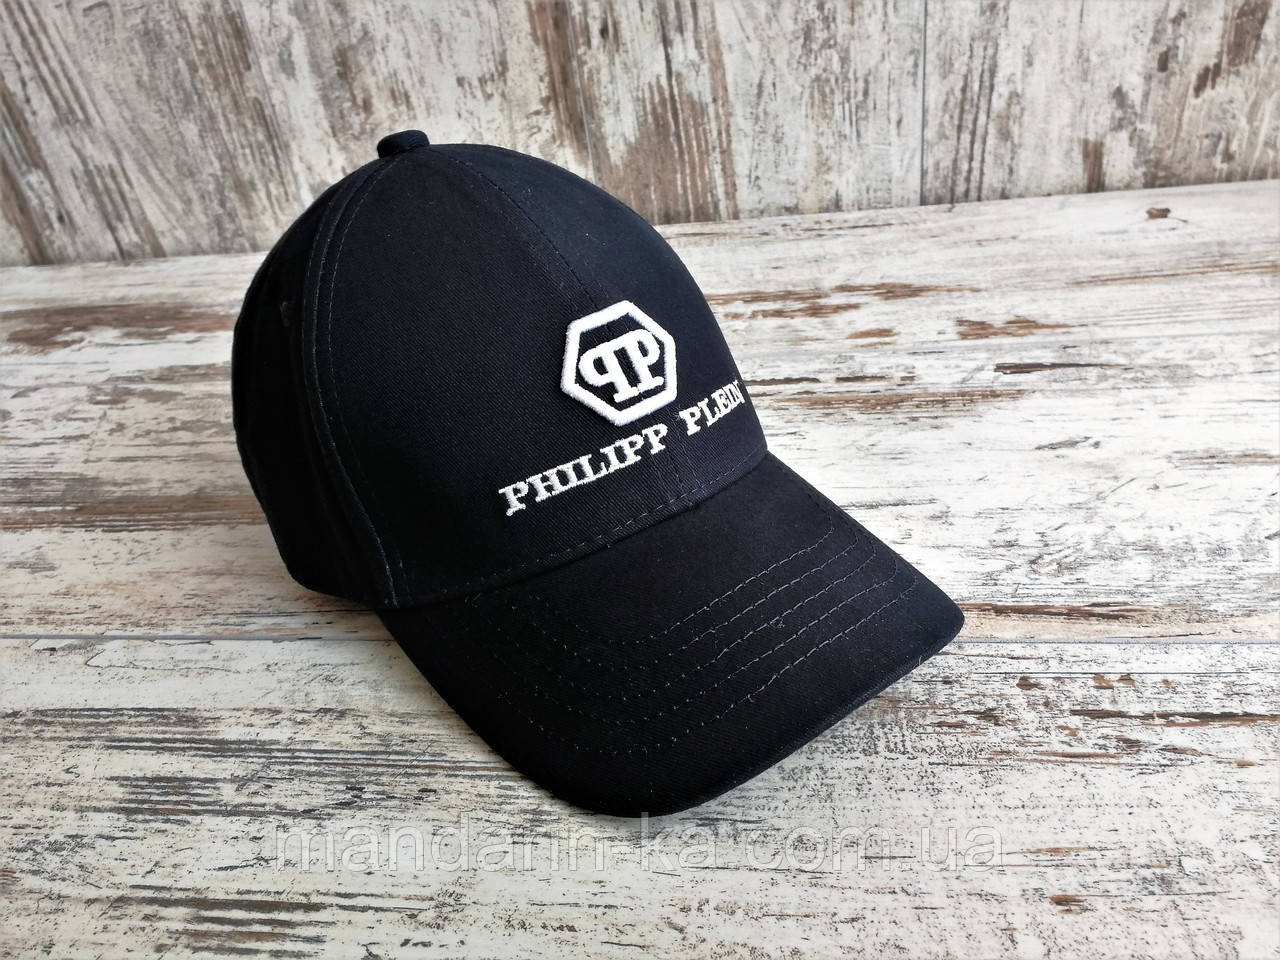 Кепка бейсболка блайзер филипп плейн Philipp Plein Филипп Плейн темно-синий (реплика)